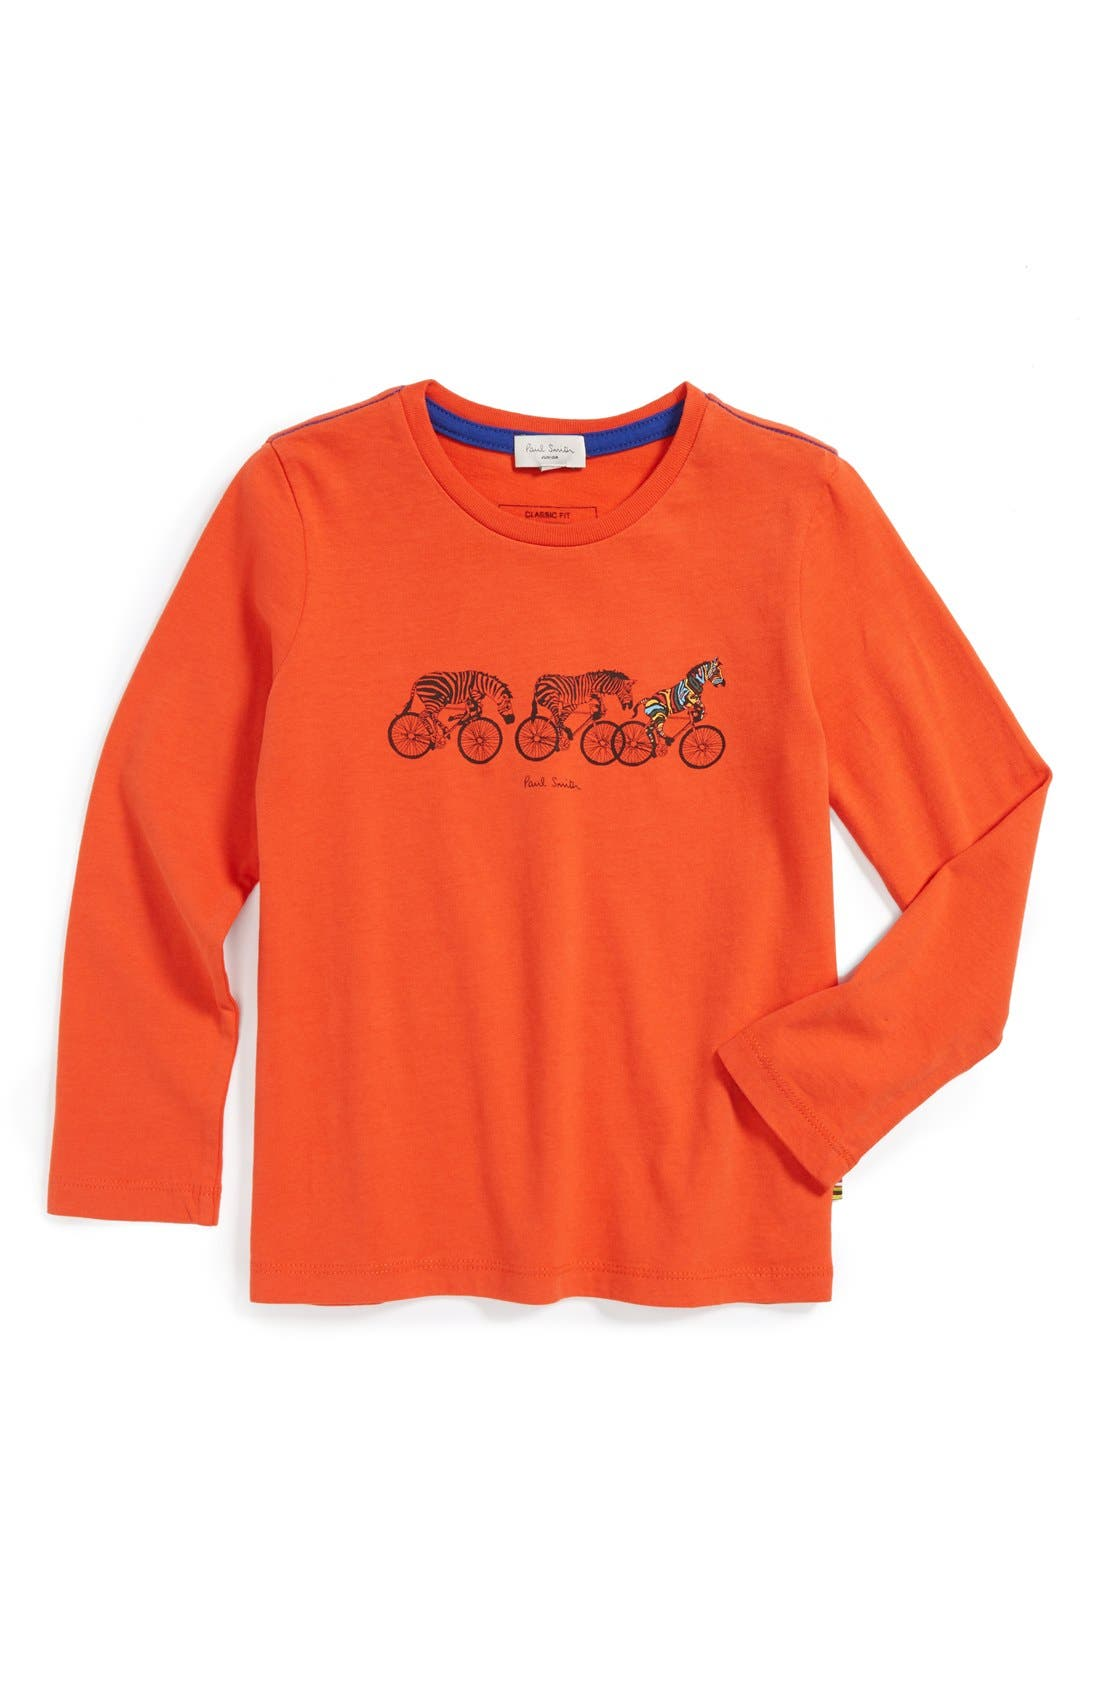 Alternate Image 1 Selected - Paul Smith Junior 'Zebras on Bikes' Long Sleeve T-Shirt (Toddler Boys, Little Boys & Big Boys)